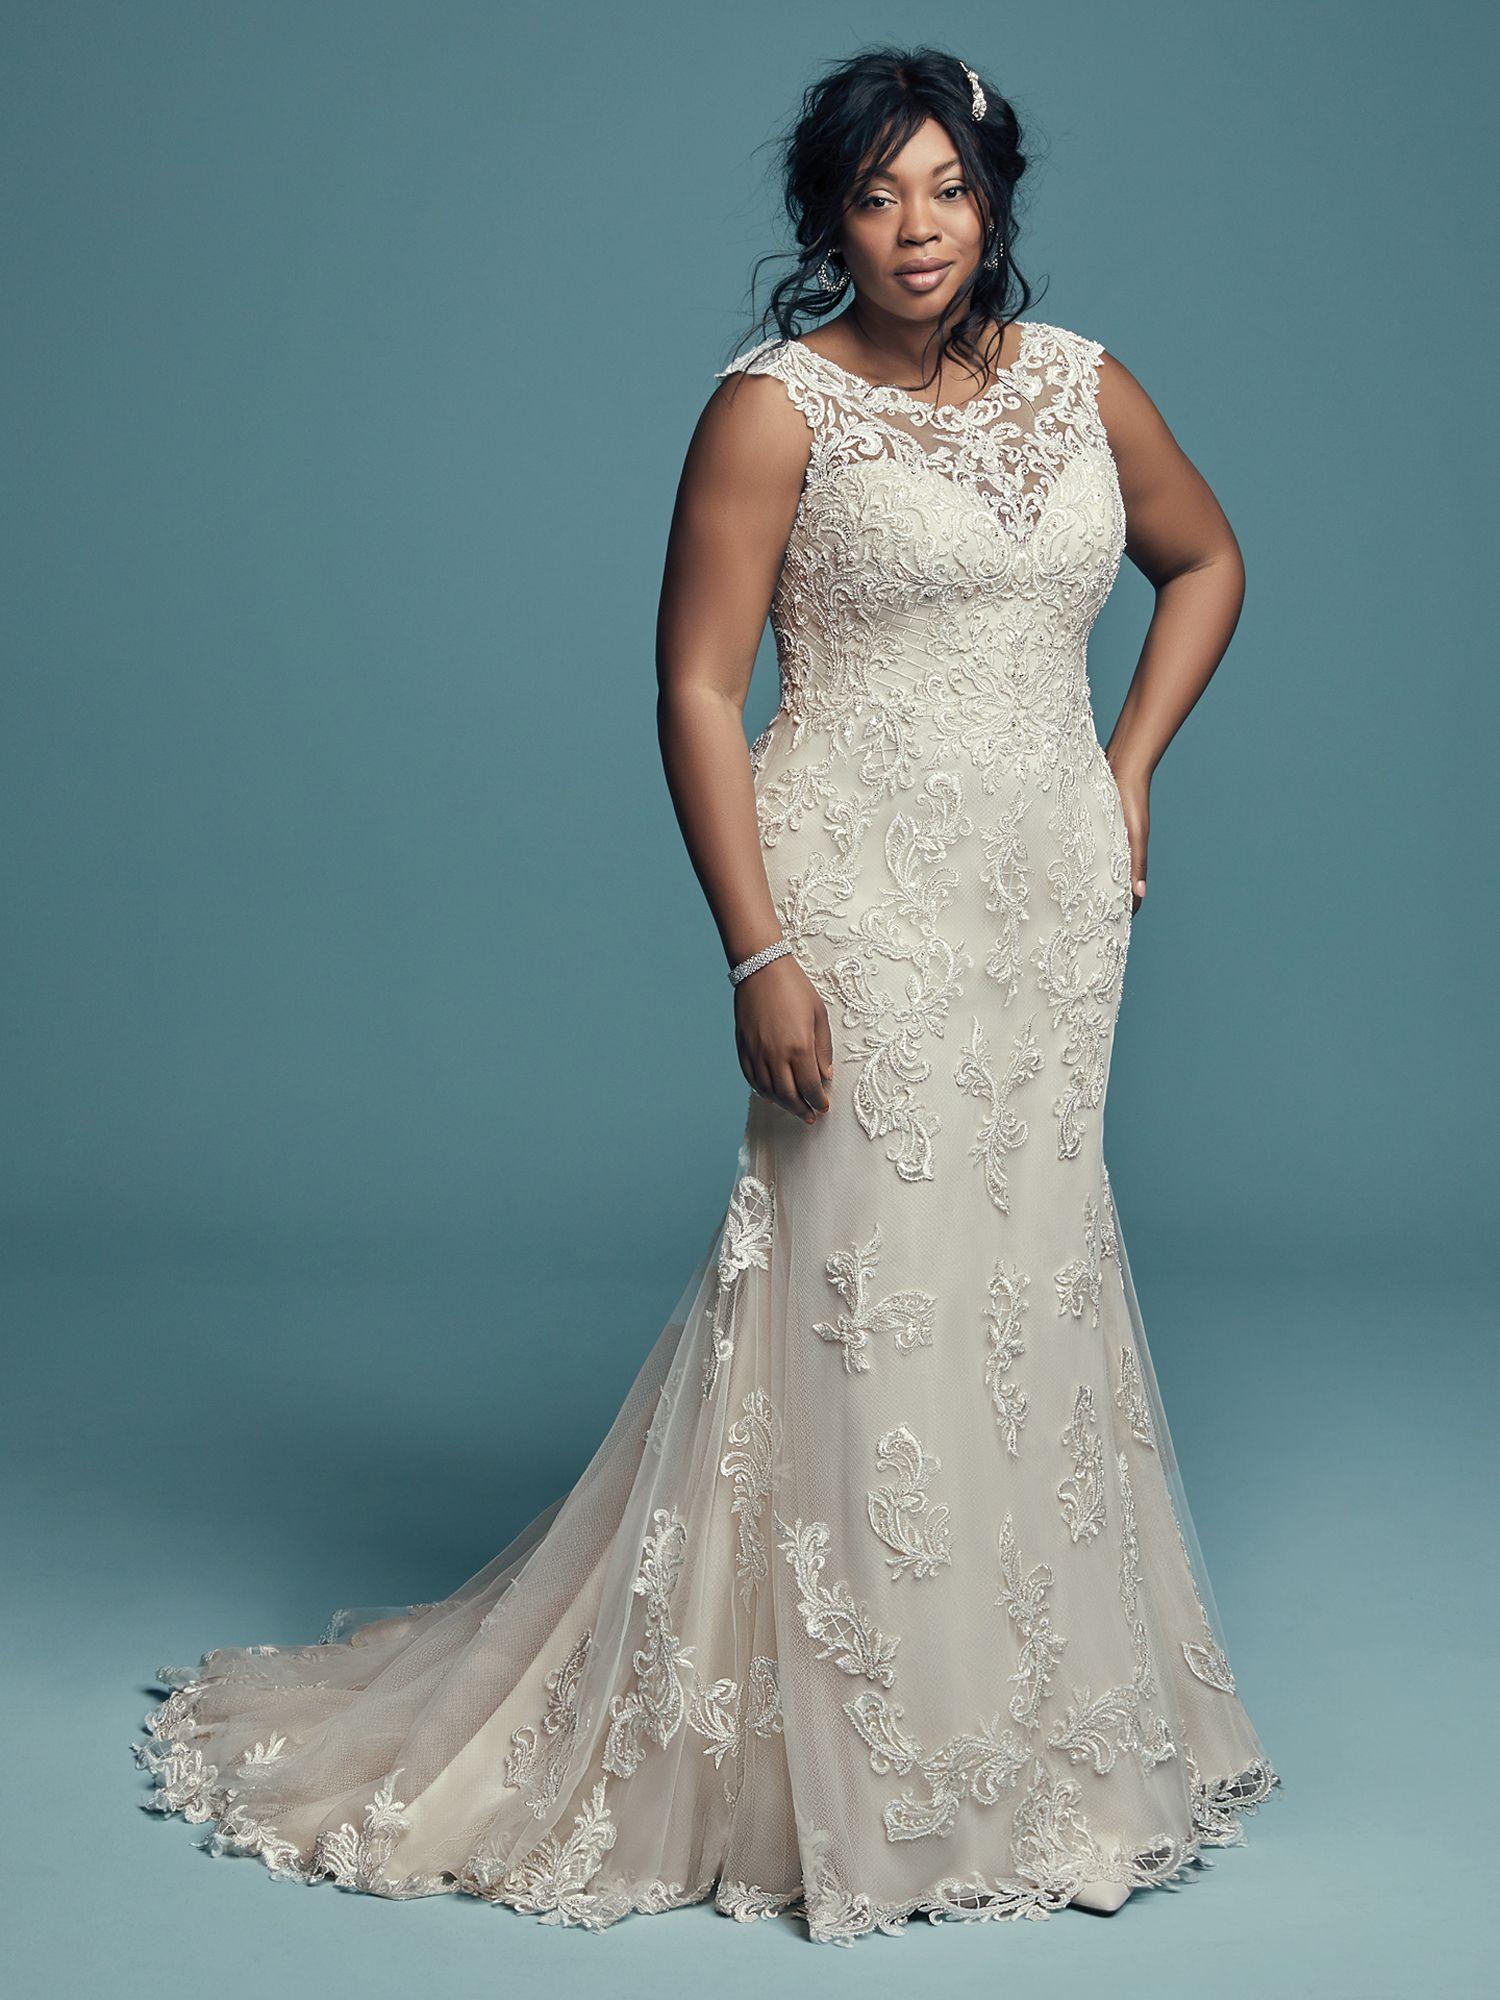 Pin On Beautiful Wedding Dresses And Bridalwear Inspiration [ 2000 x 1500 Pixel ]